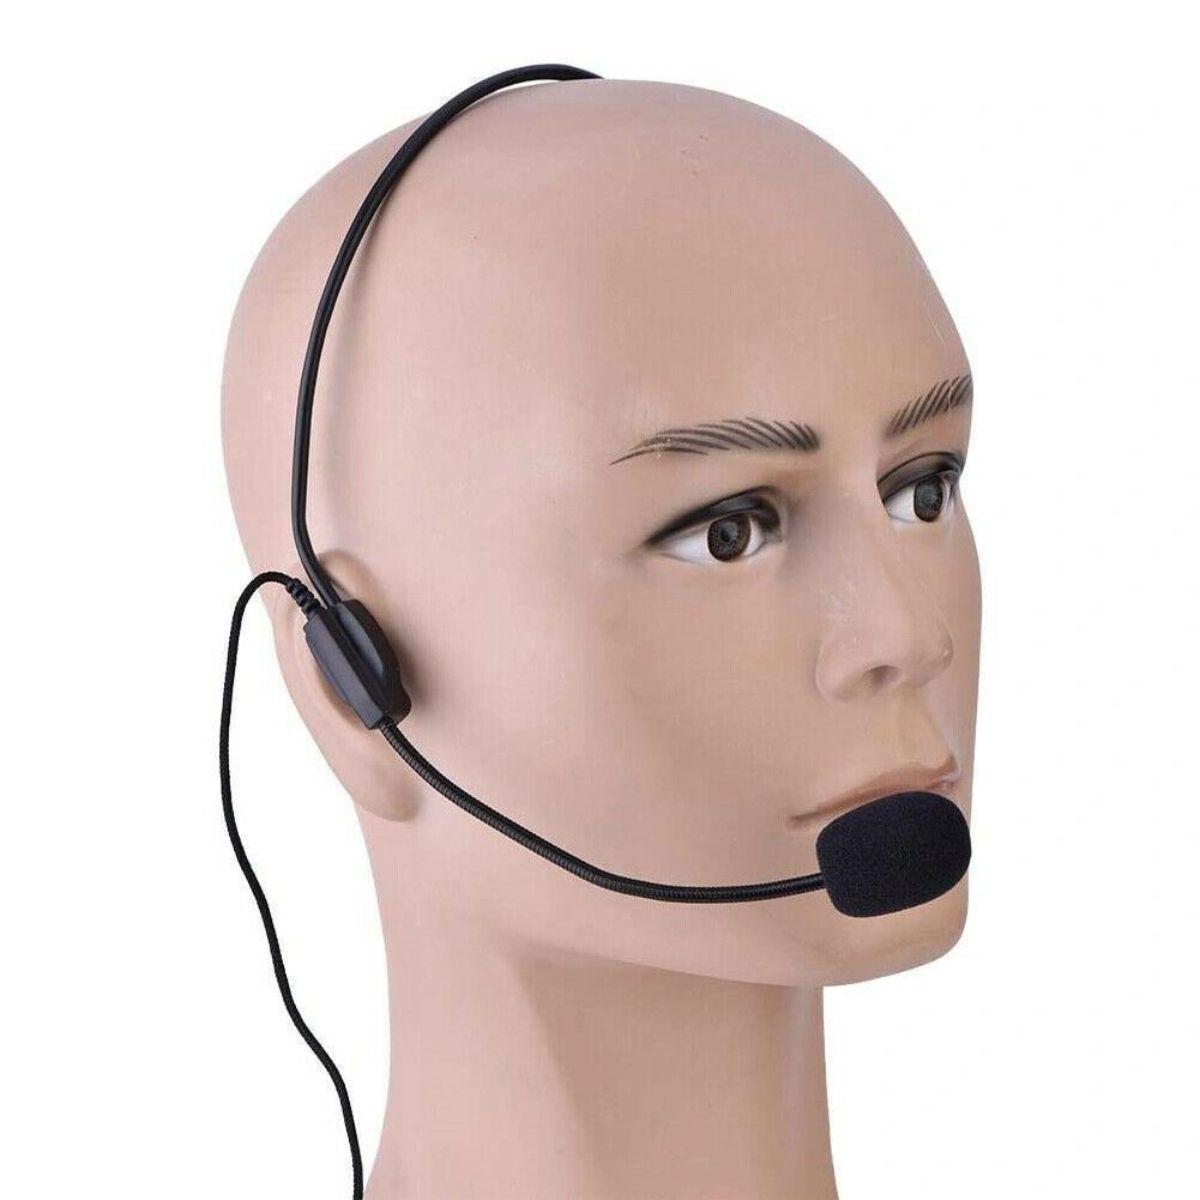 mini microfono cindenser portatil 2 1 1